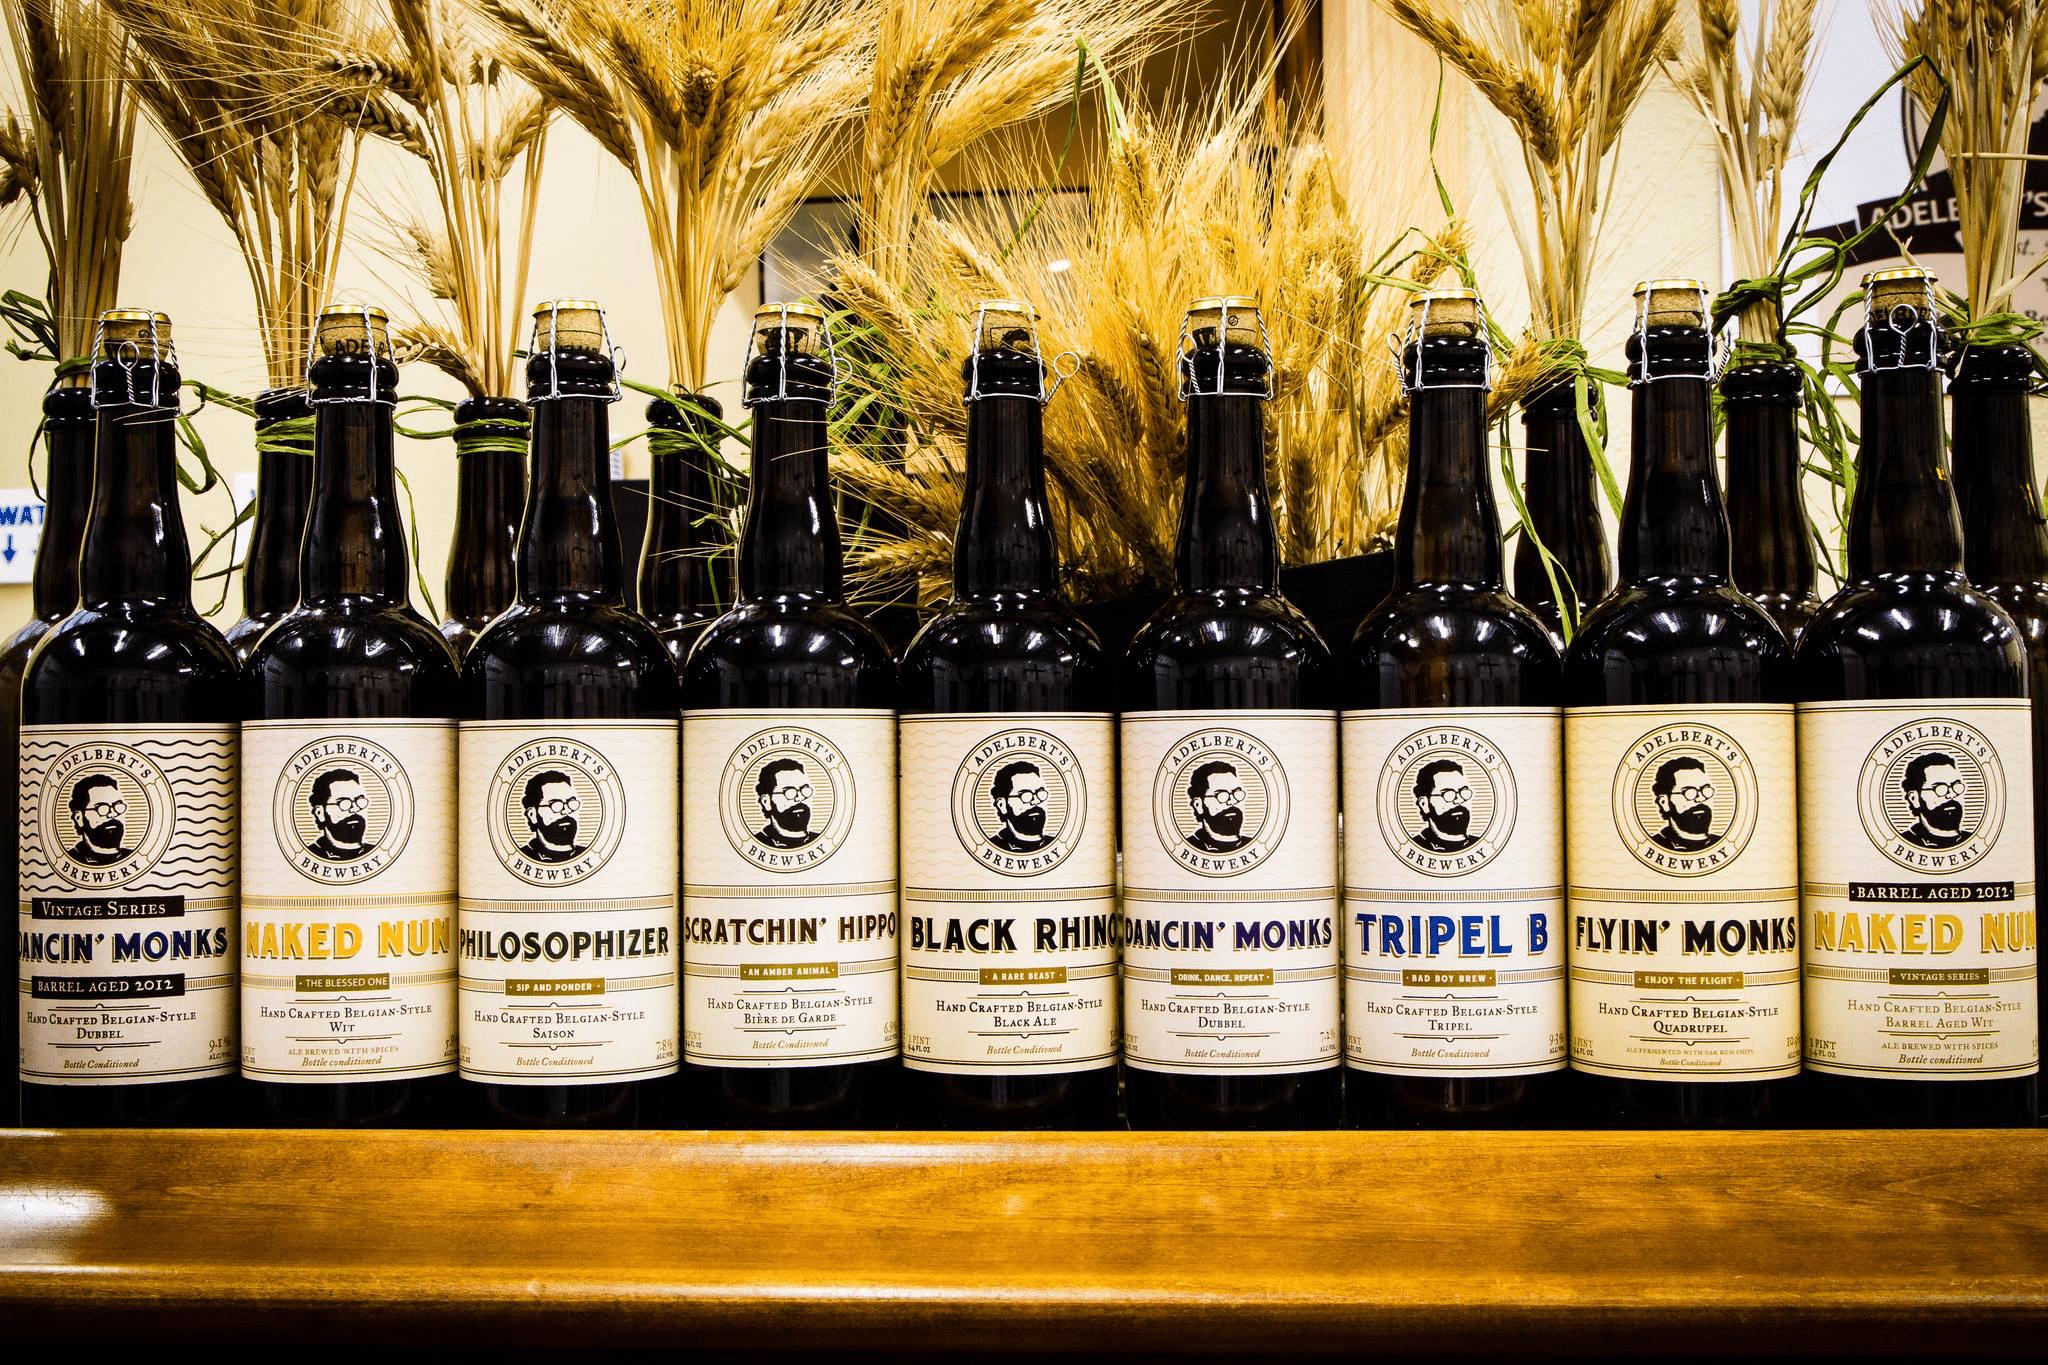 bottled beers at Adelbert's Brewery